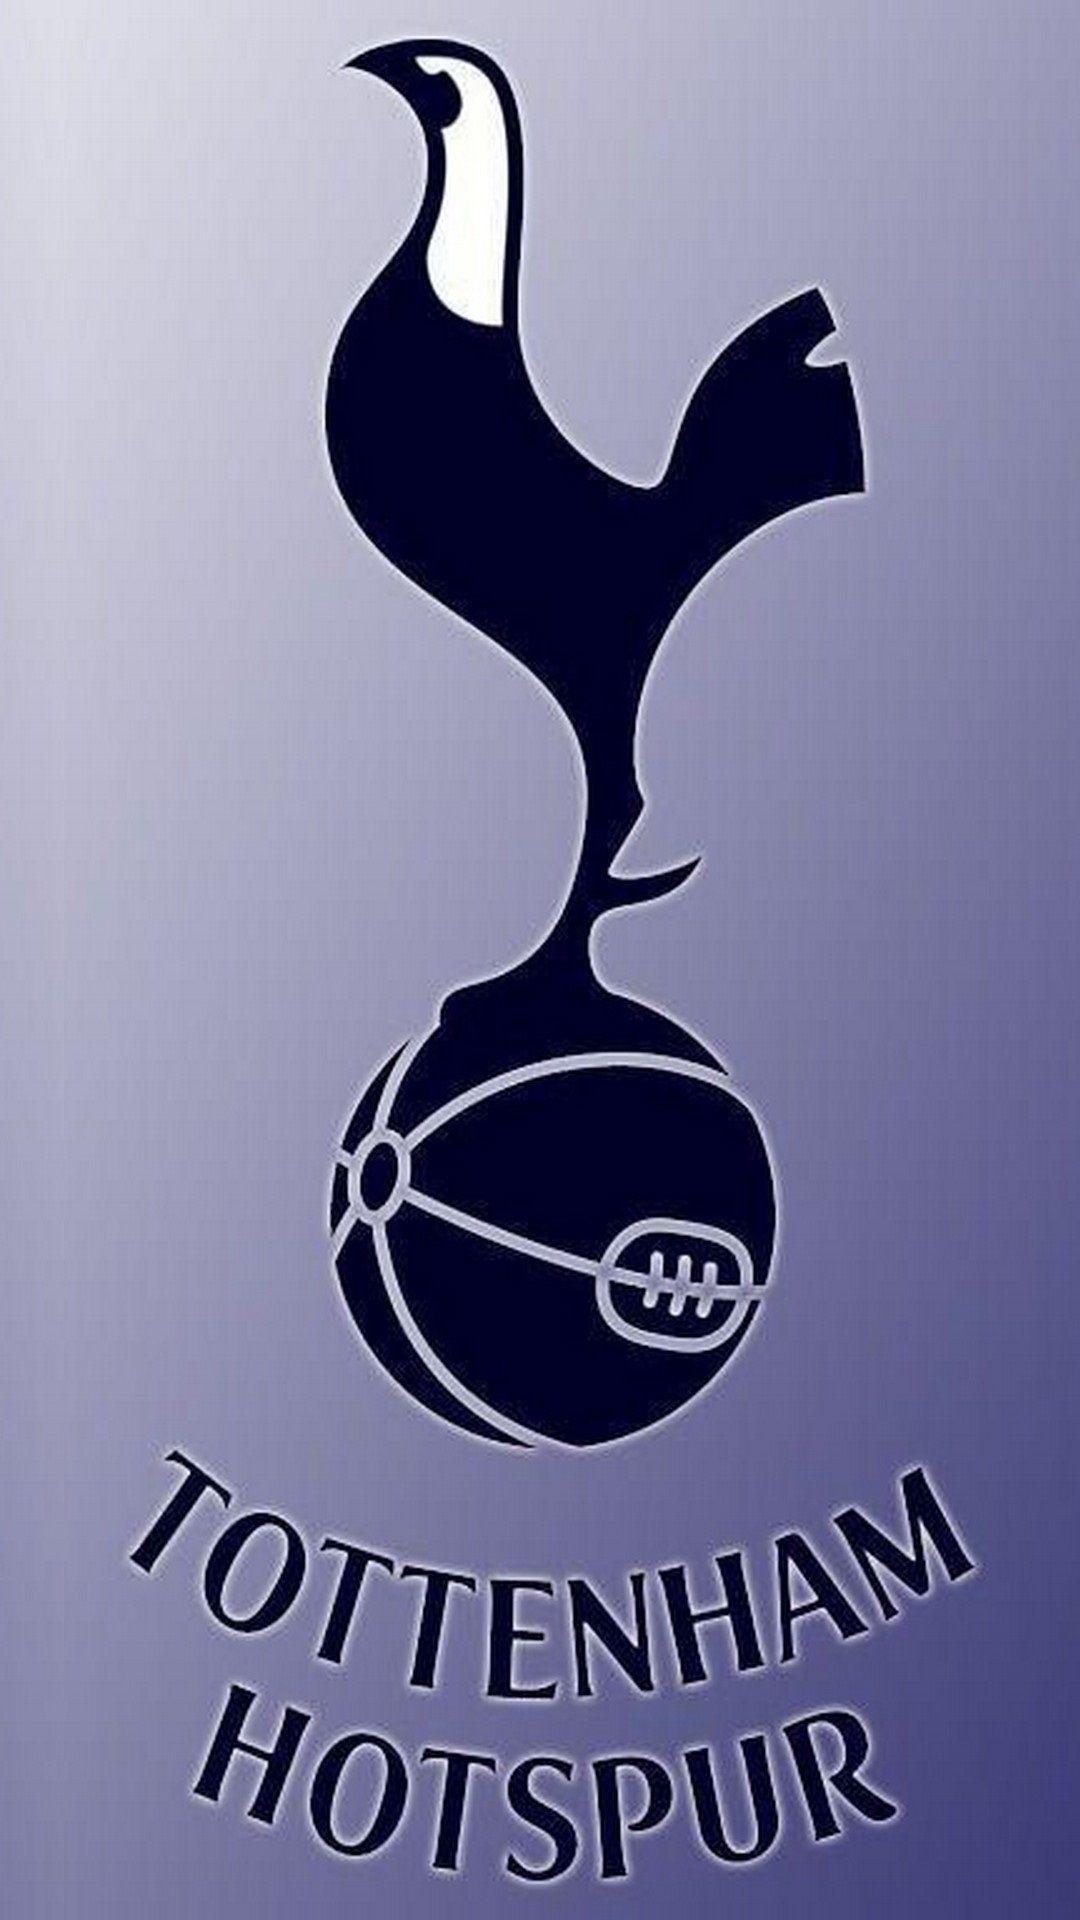 Mobile Wallpapers Tottenham Hotspur 2020 3d Iphone Wallpaper Tottenham Hotspur Wallpaper Tottenham Hotspur Tottenham